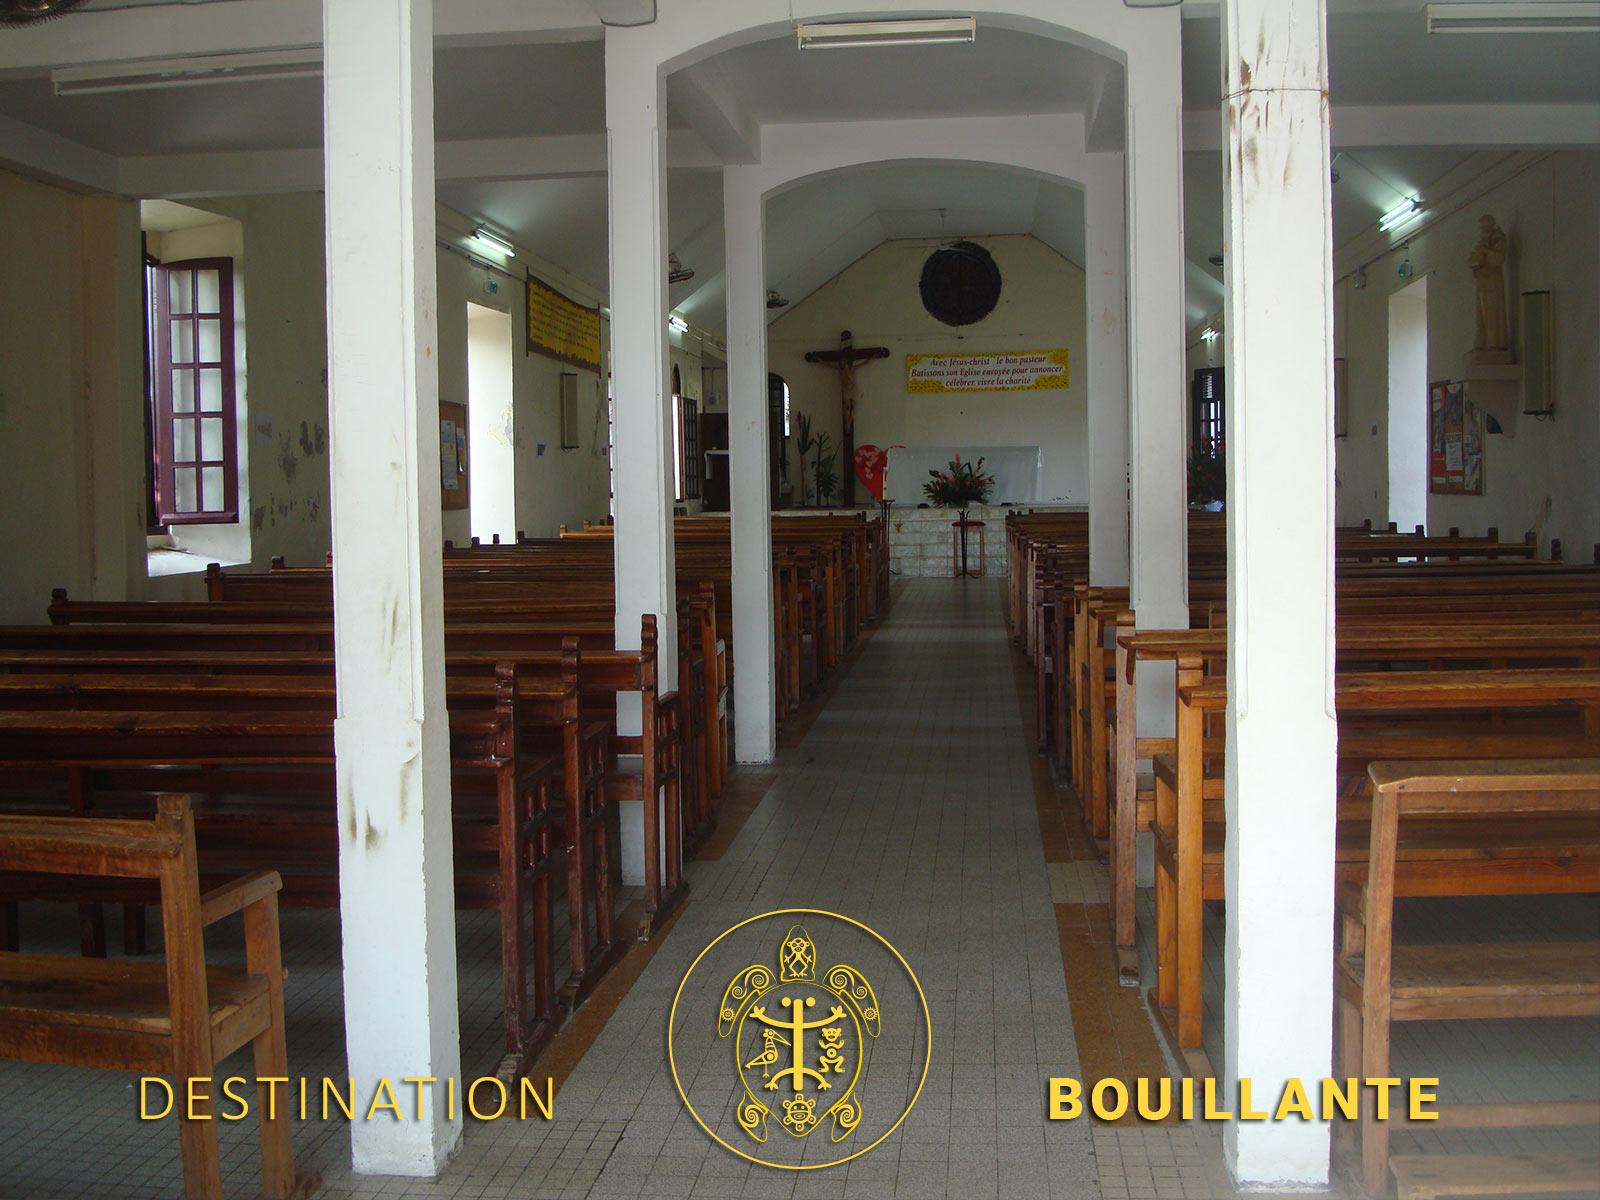 Eglise Saint-Louis - Bouillante